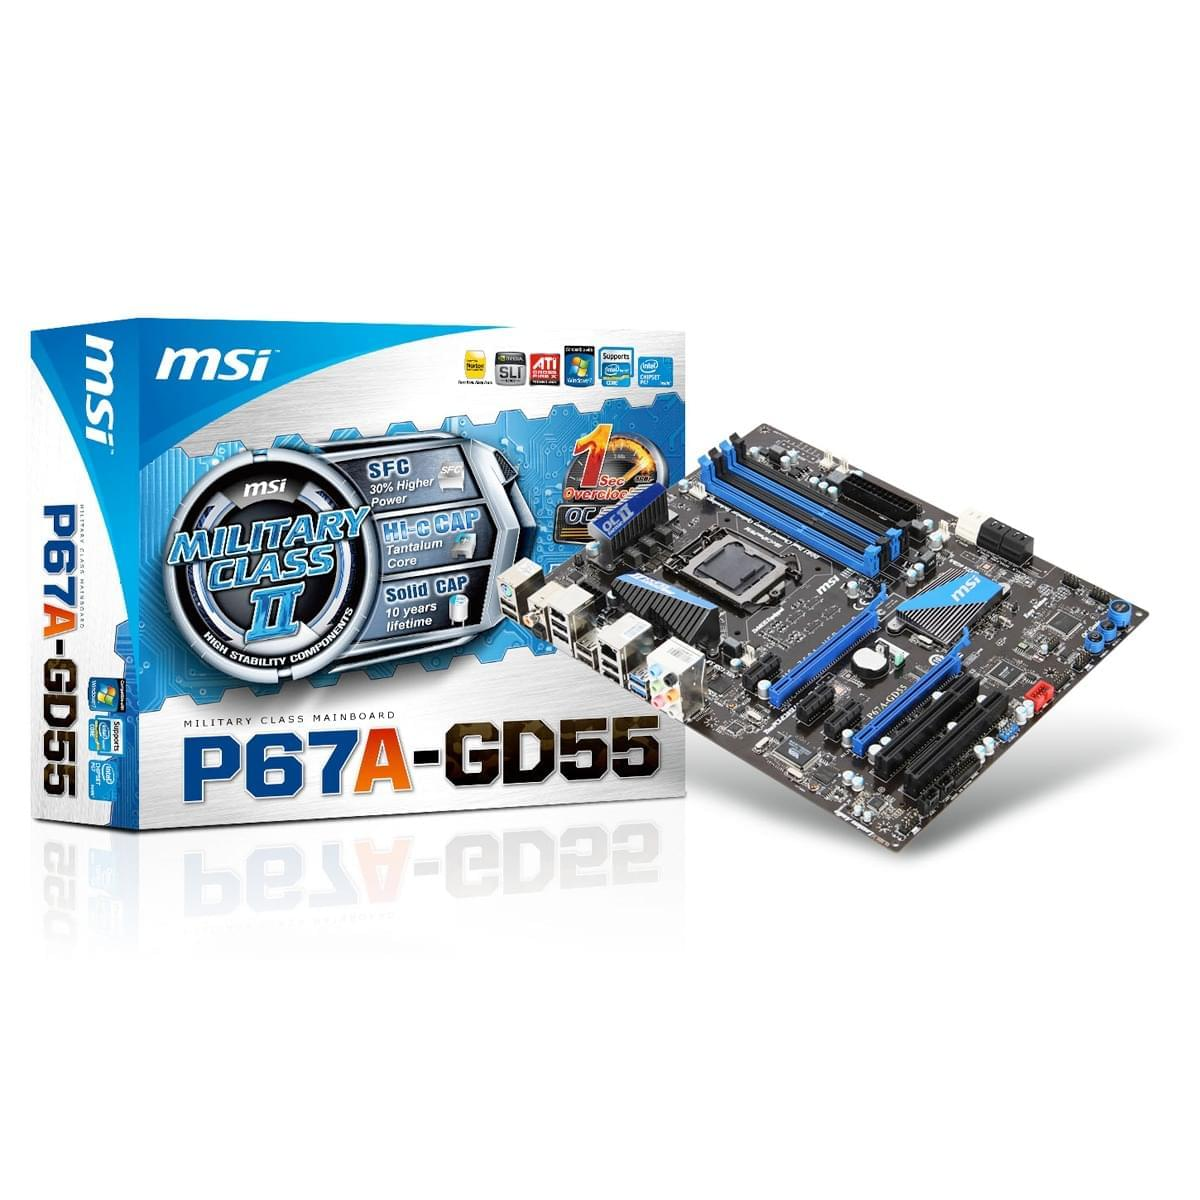 MSI P67A-GD55 G3 (P67A-GD55(B3) obso) - Achat / Vente Carte Mère sur Cybertek.fr - 0